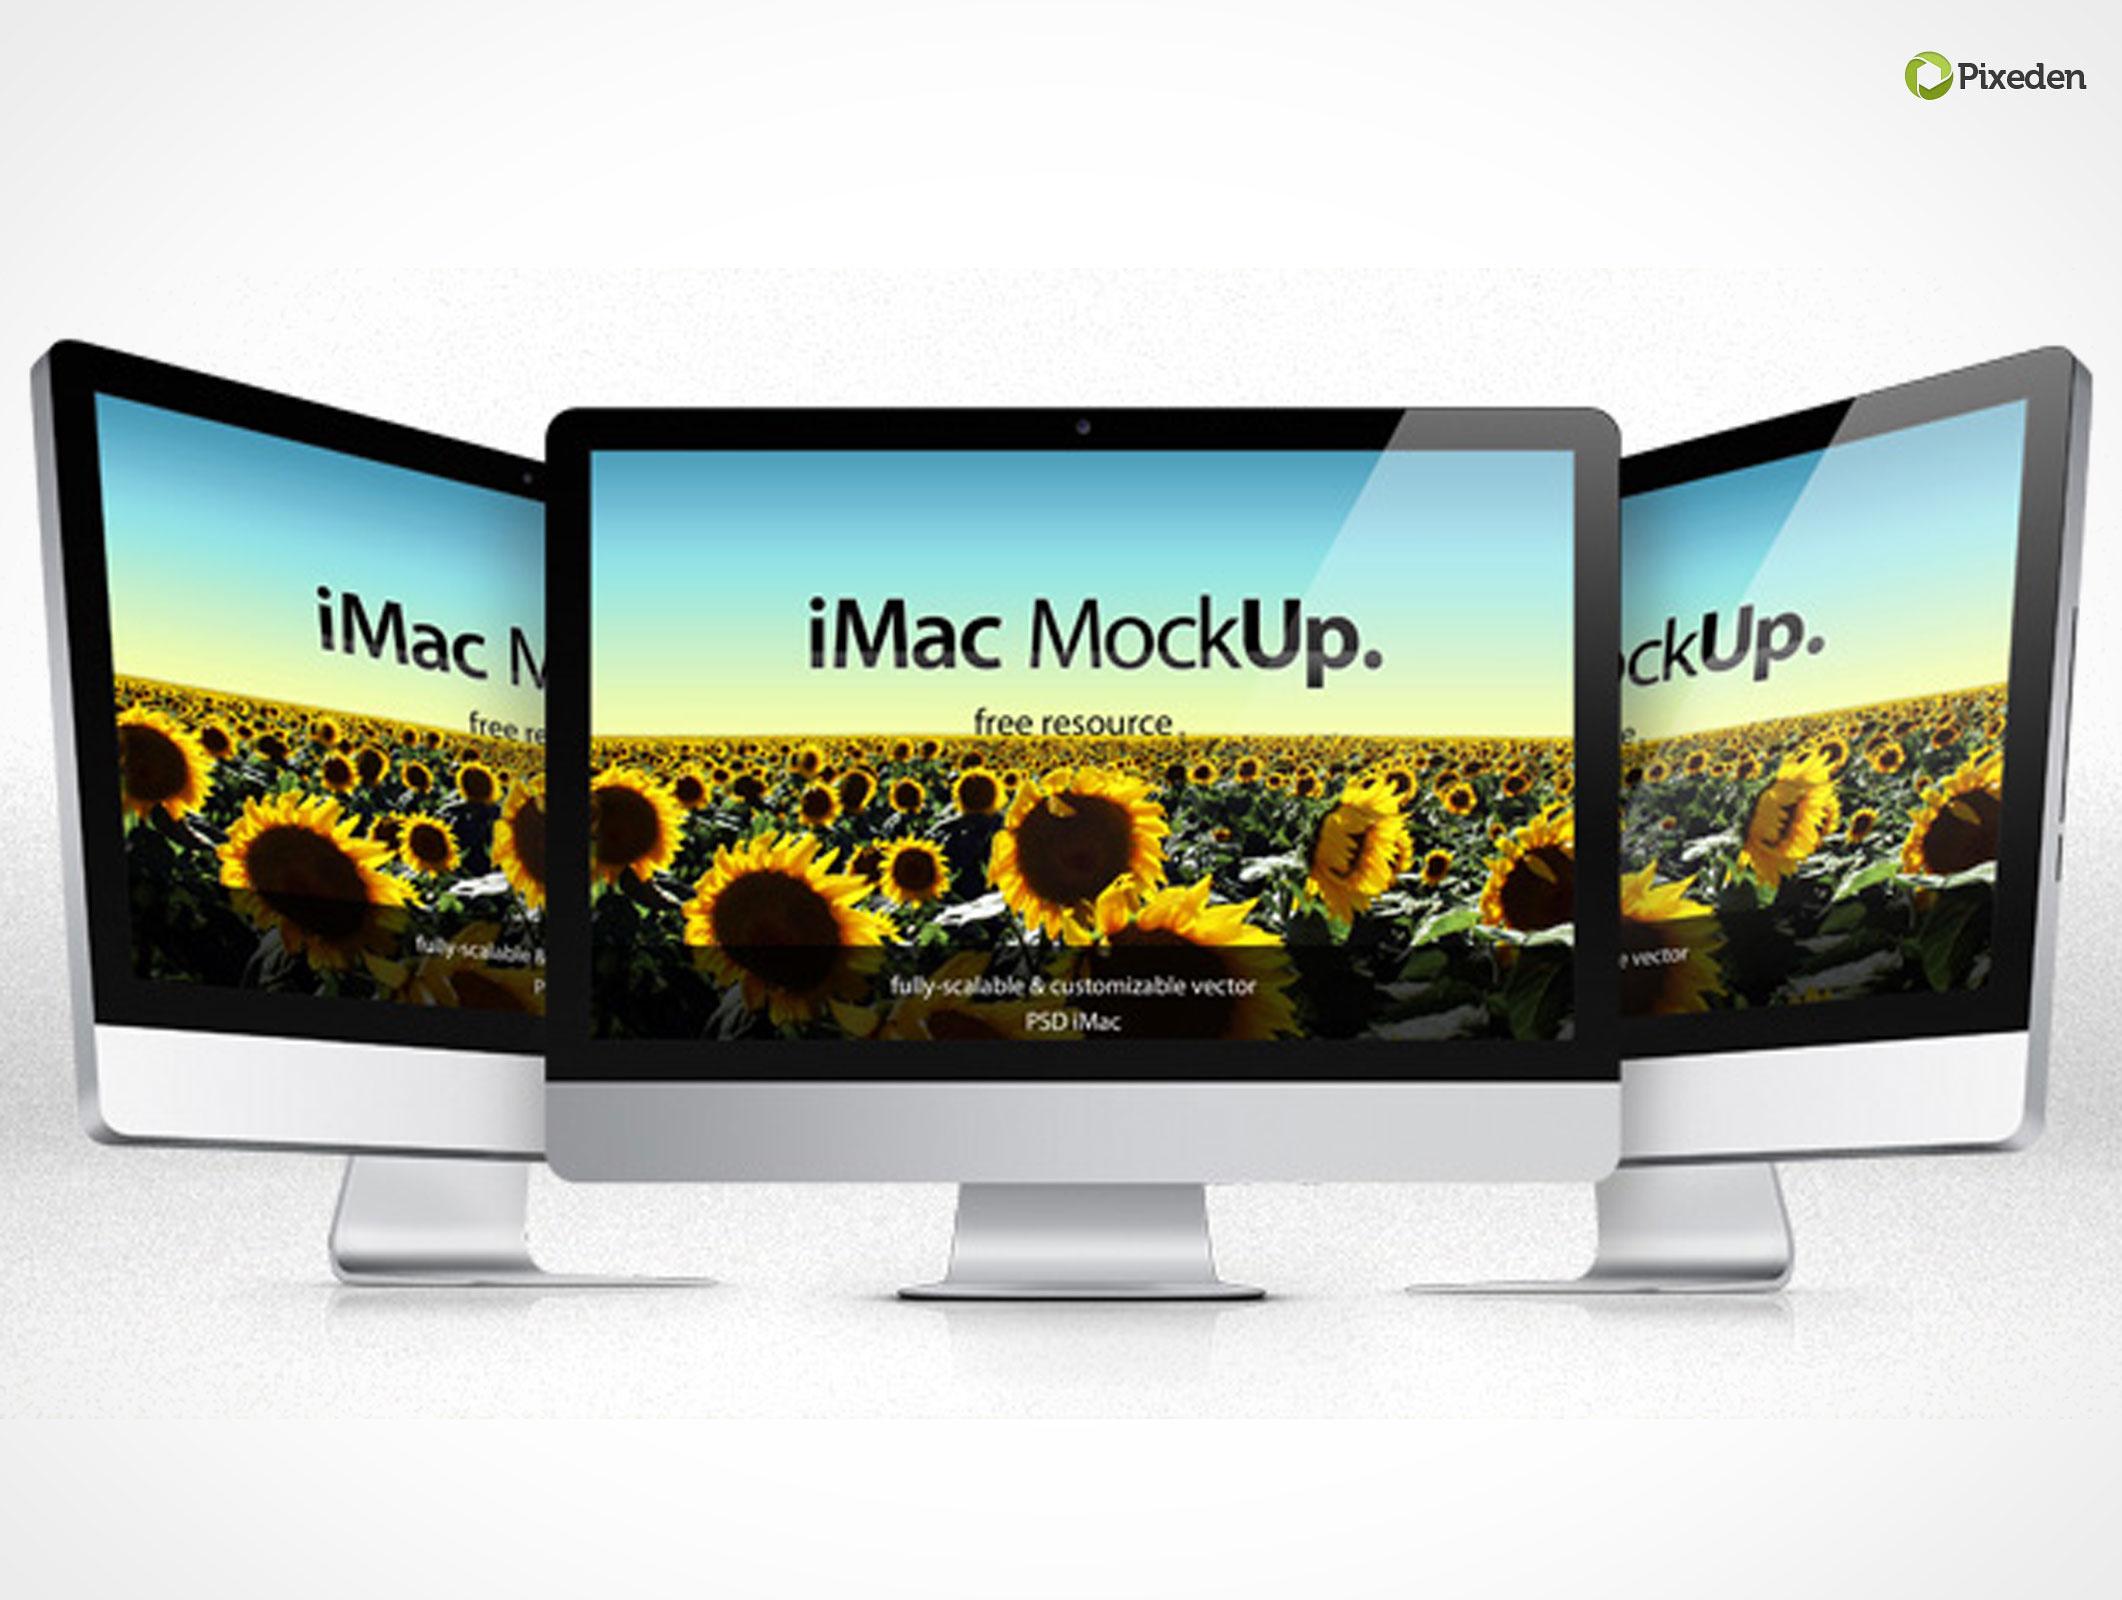 13 Free IMac Mockup PSD Images